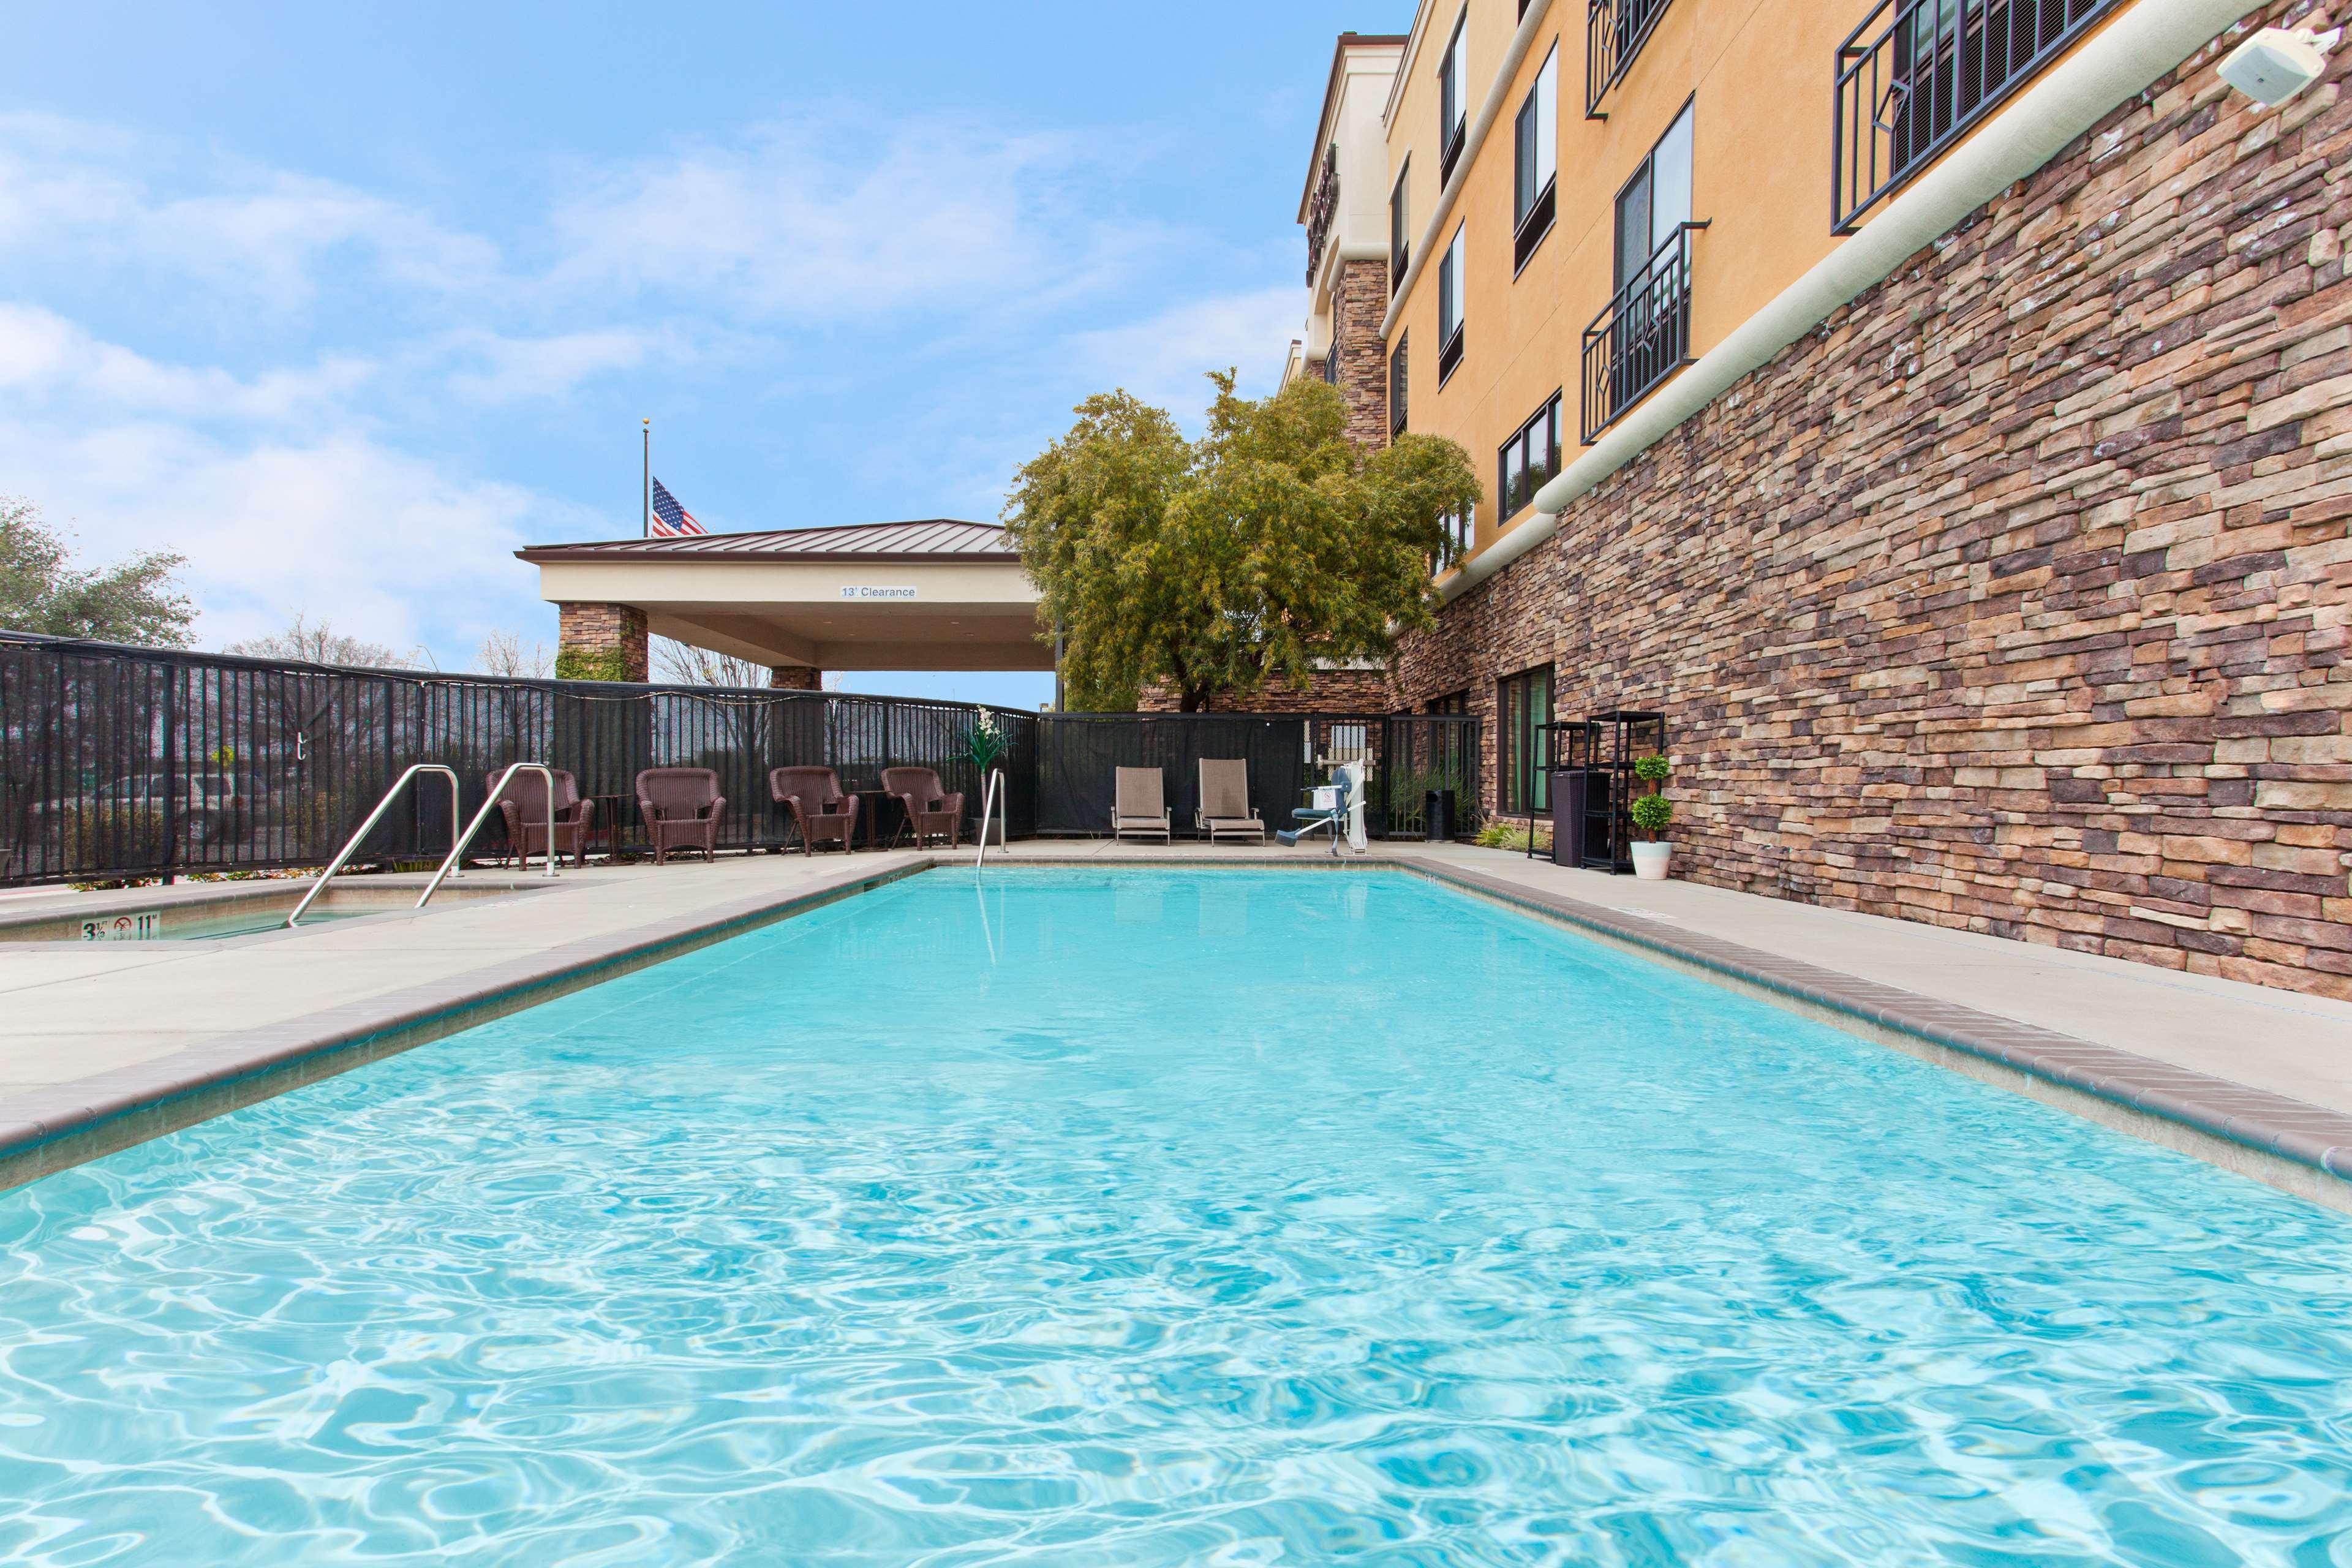 Hampton Inn & Suites Roseville image 2